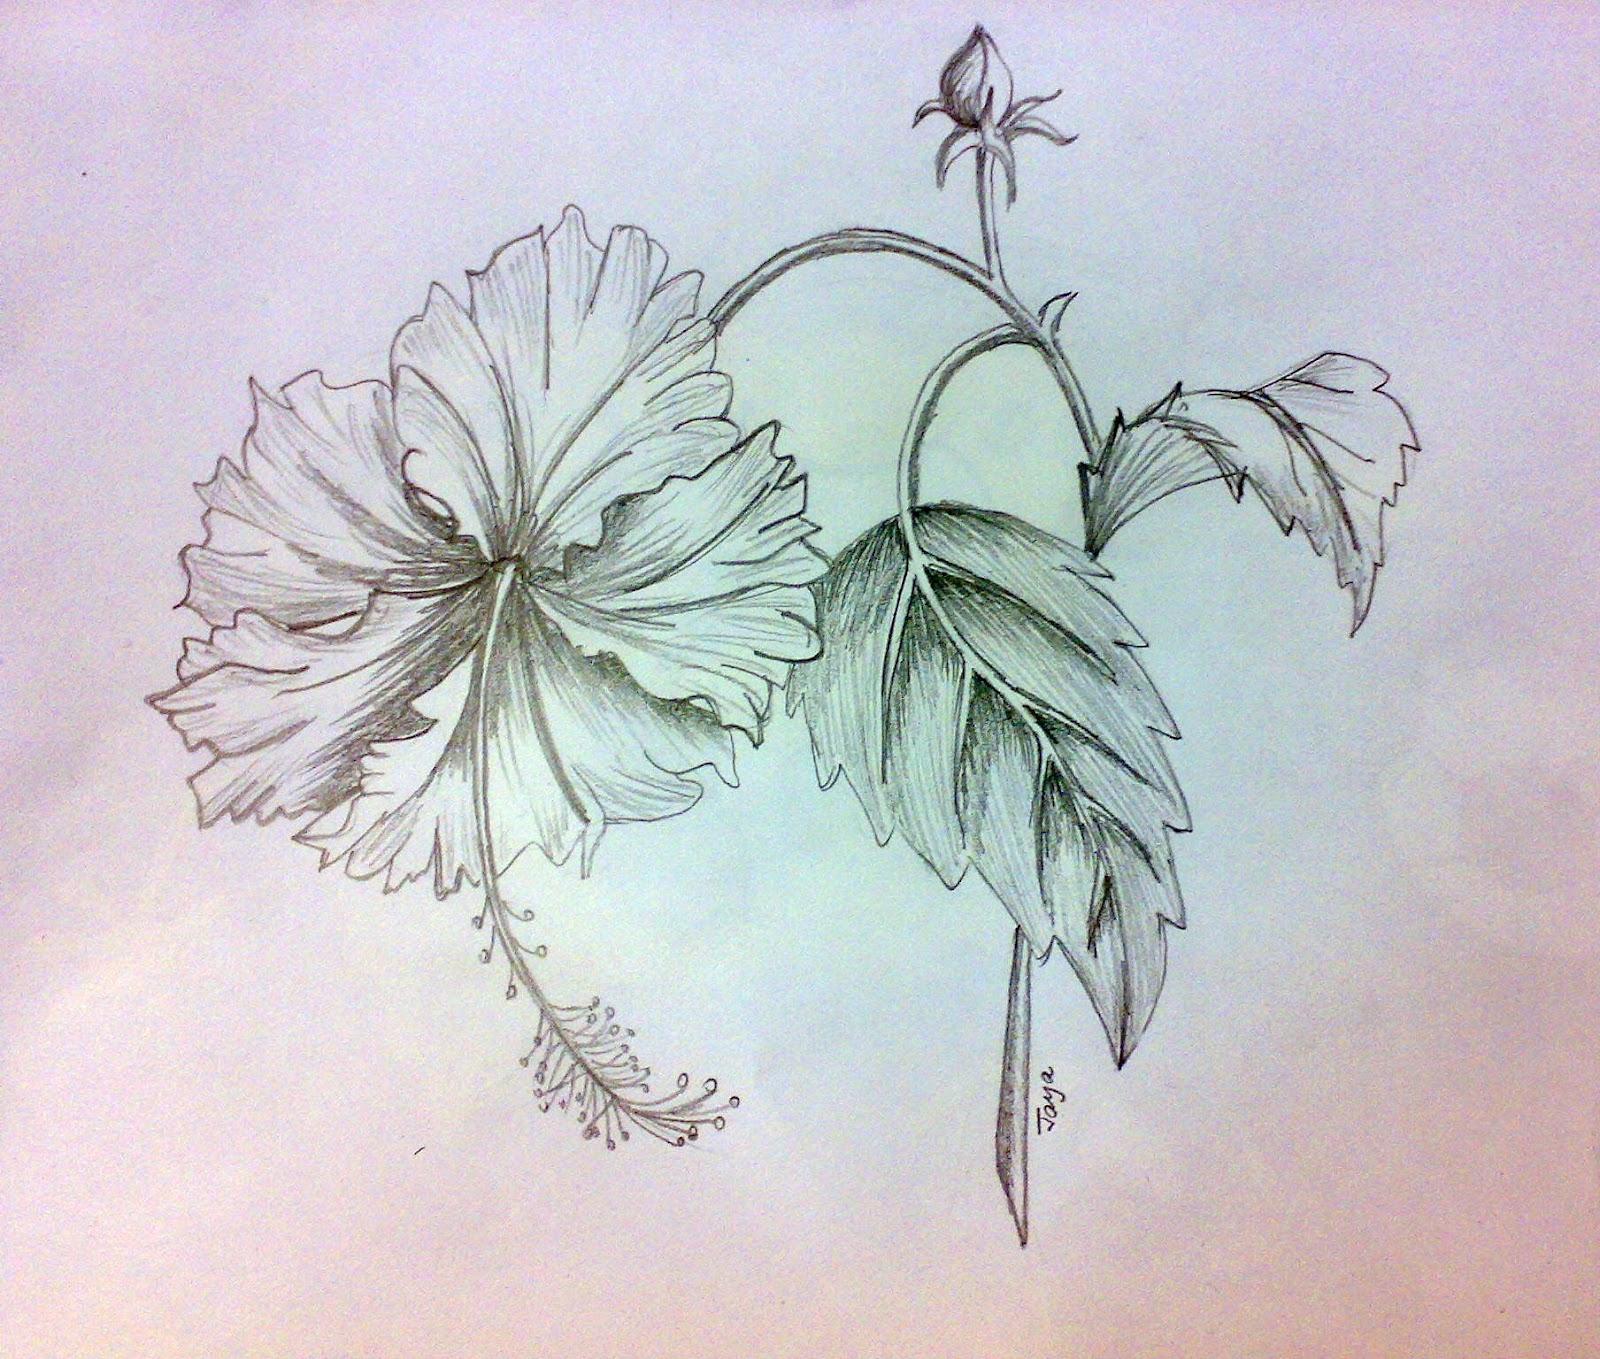 1600x1359 Pencil Sketch Of Hibiscus Flower Jaya's Shades Pencil Sketching